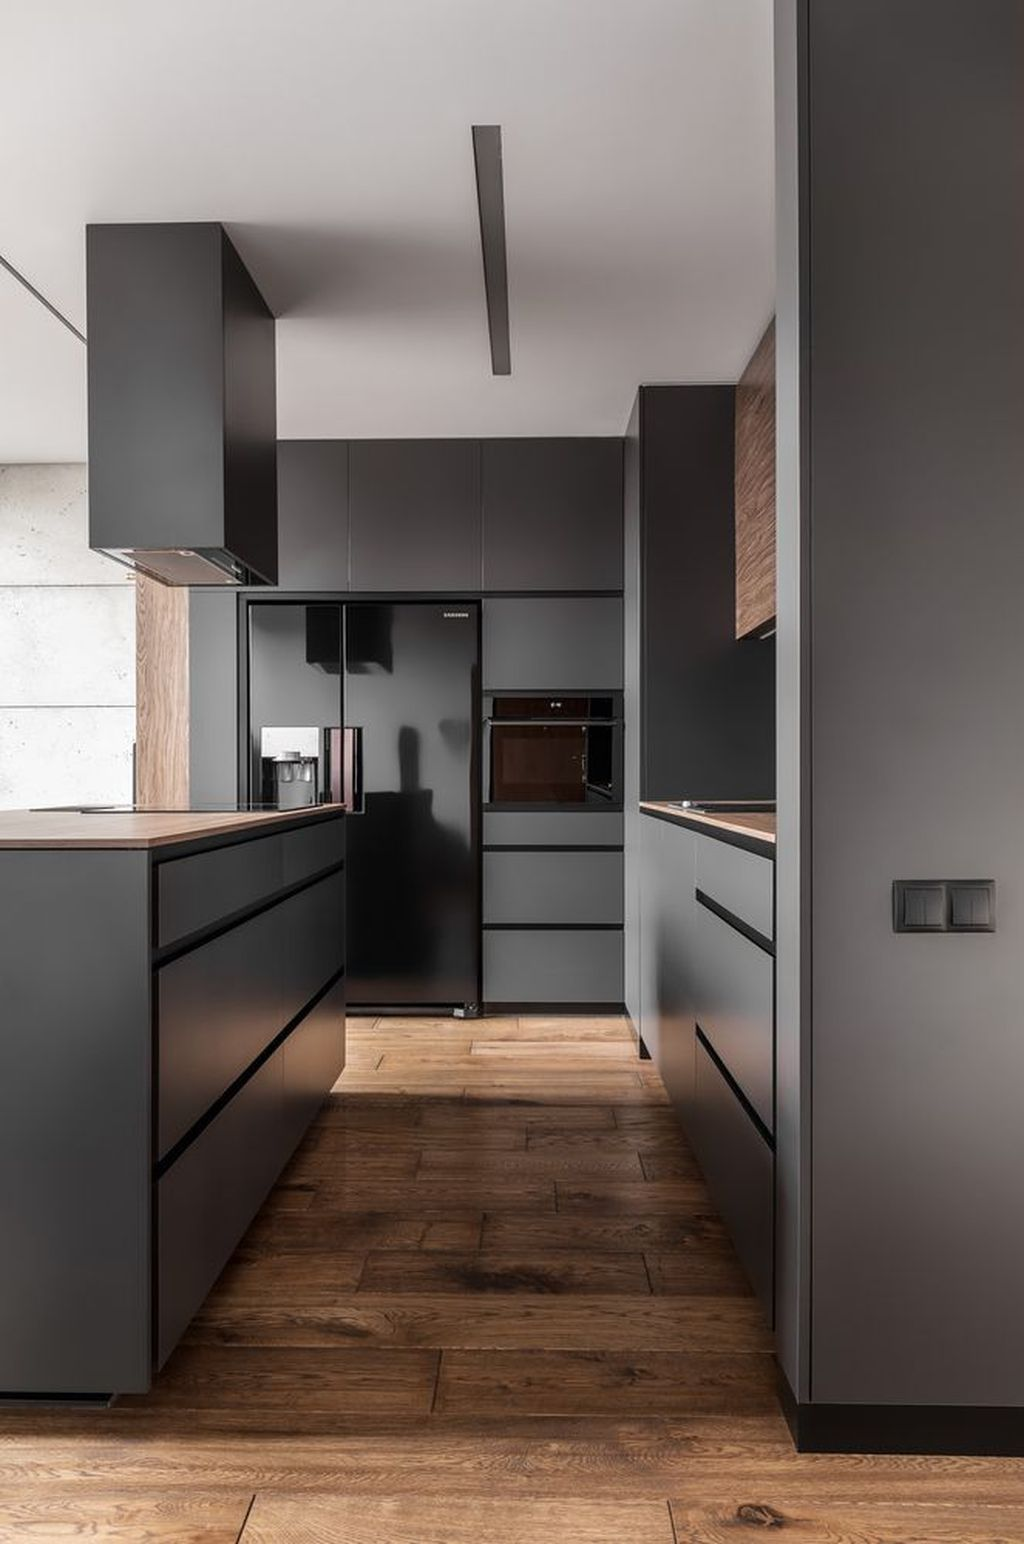 35 Cool Kitchen Design Ideas With Temporary Looks In 2020 Modern Grey Kitchen Modern Kitchen Design Popular Kitchen Designs